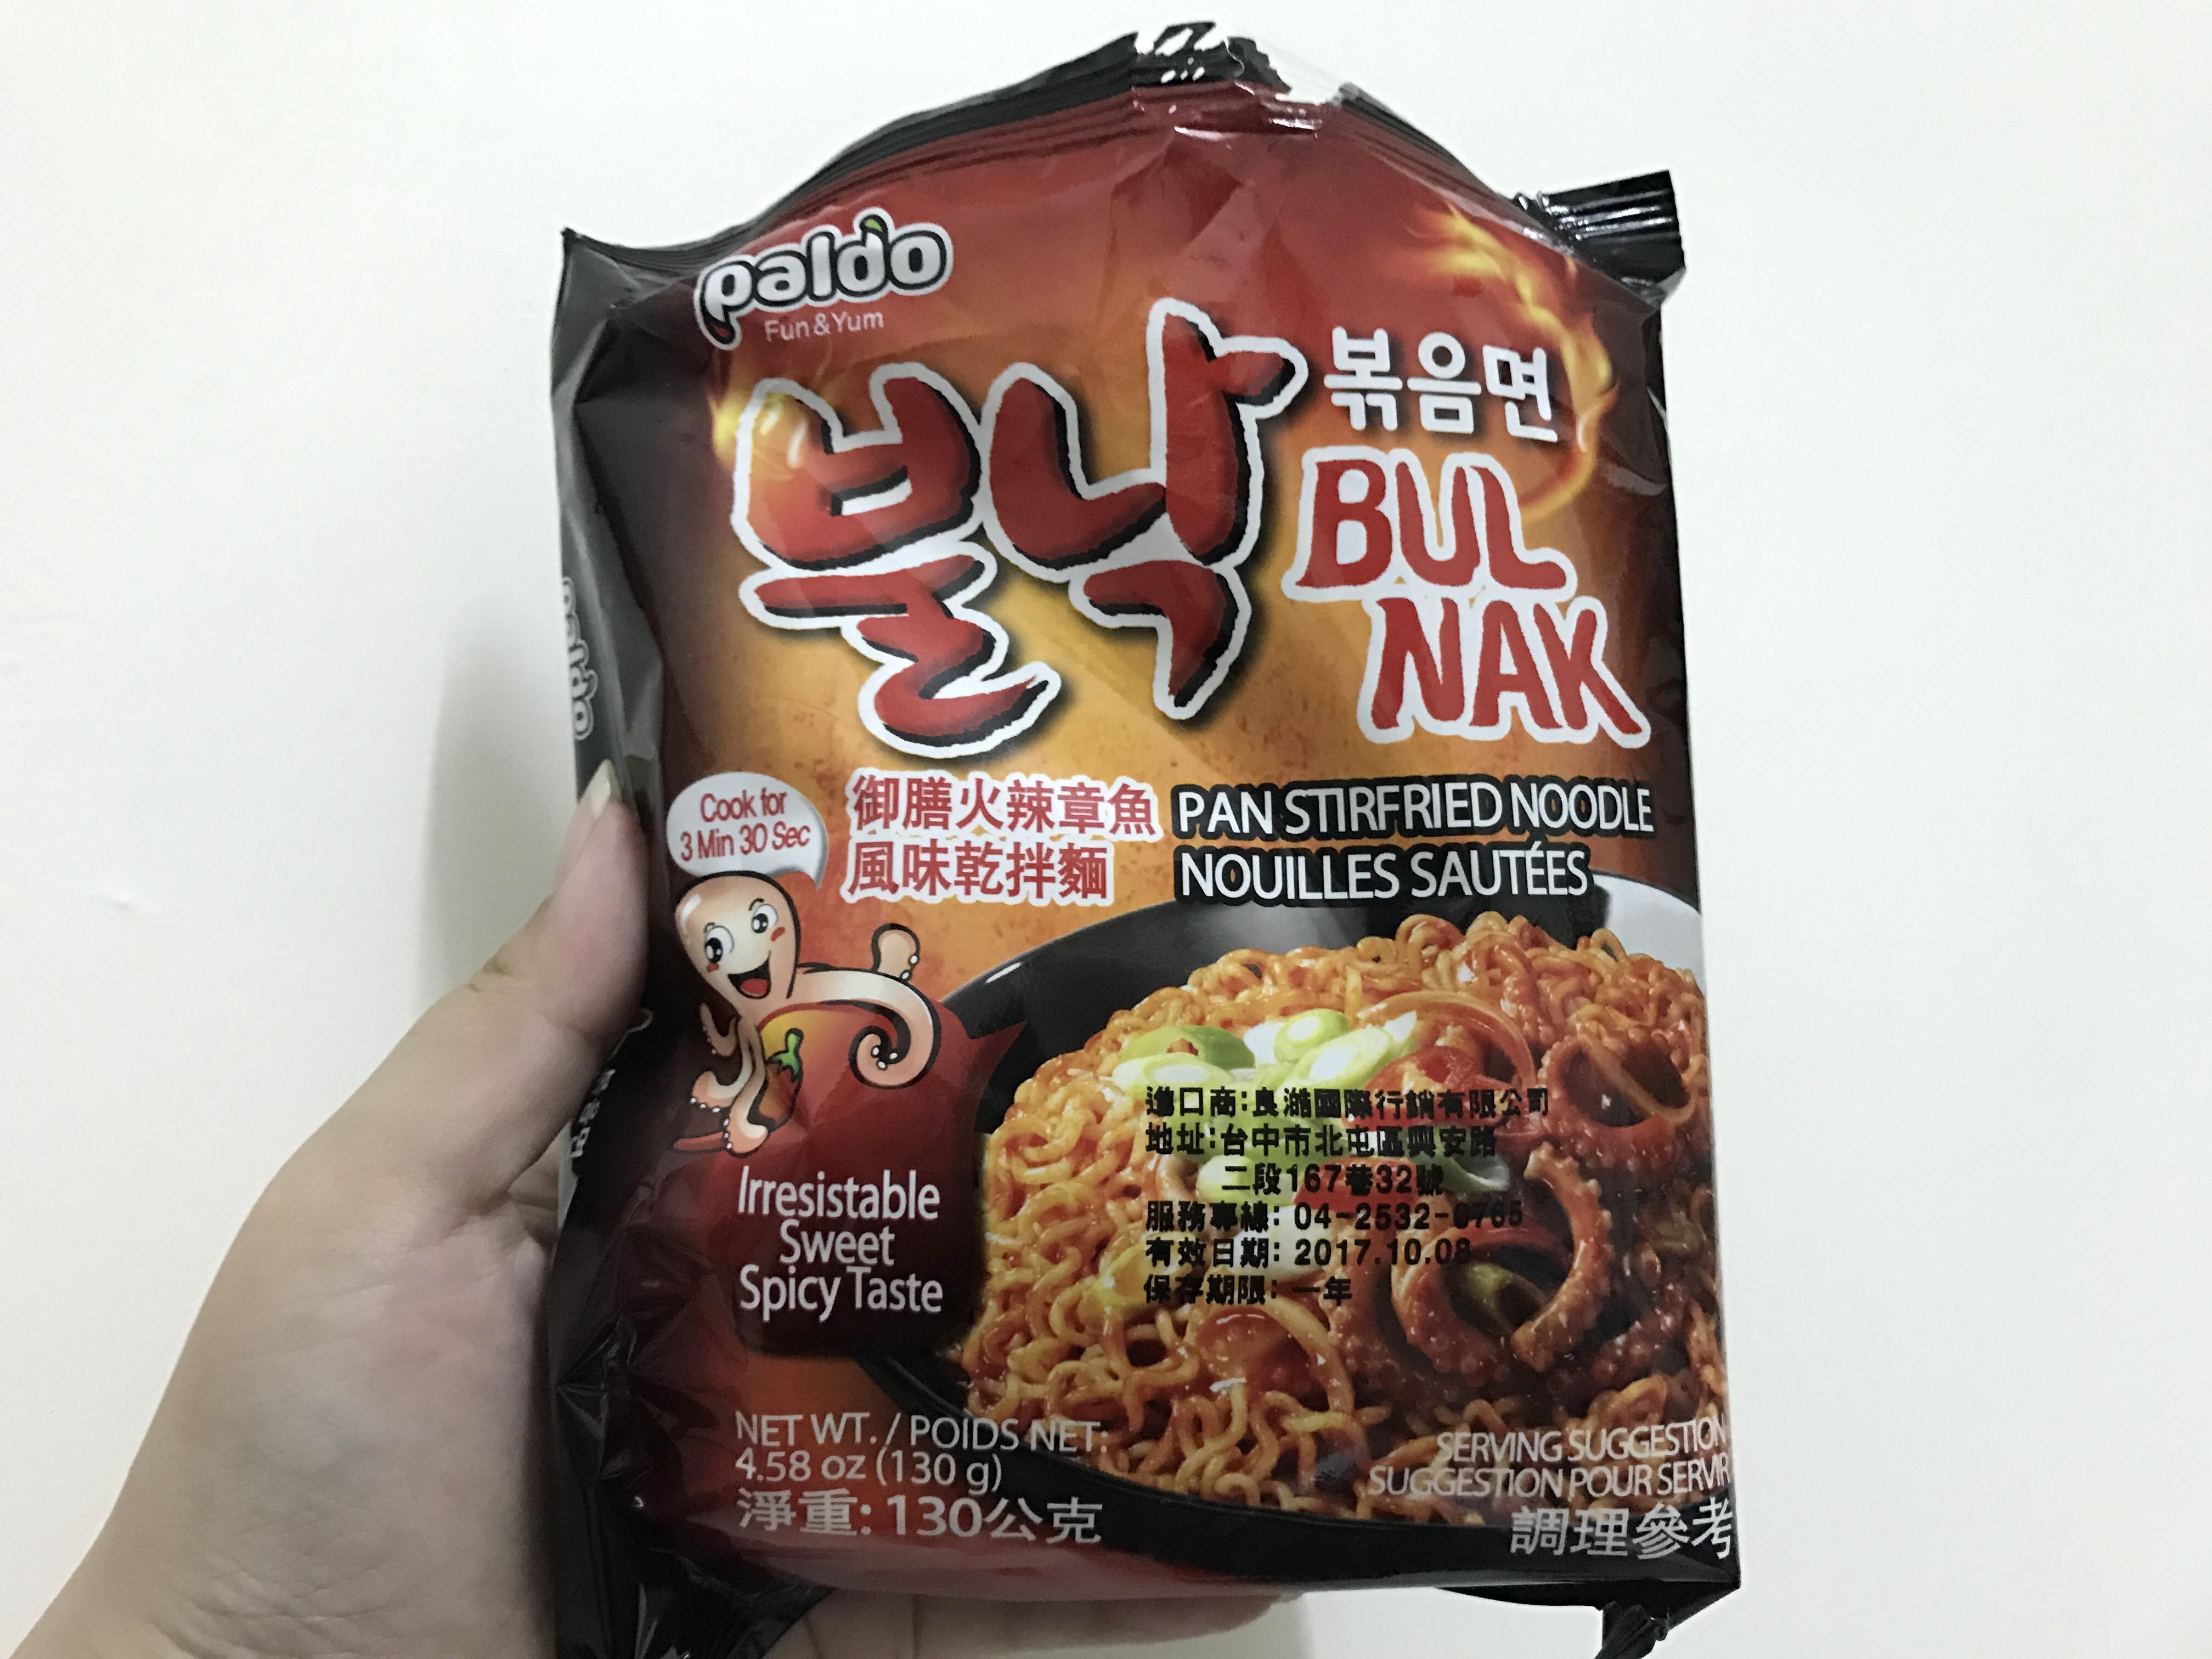 Paldo Bulnak Bokkummyun Hot Spicy Octopus Ramyun 4 X 130 Gram Spec Bowl Noodle Shrimp Flavor 86